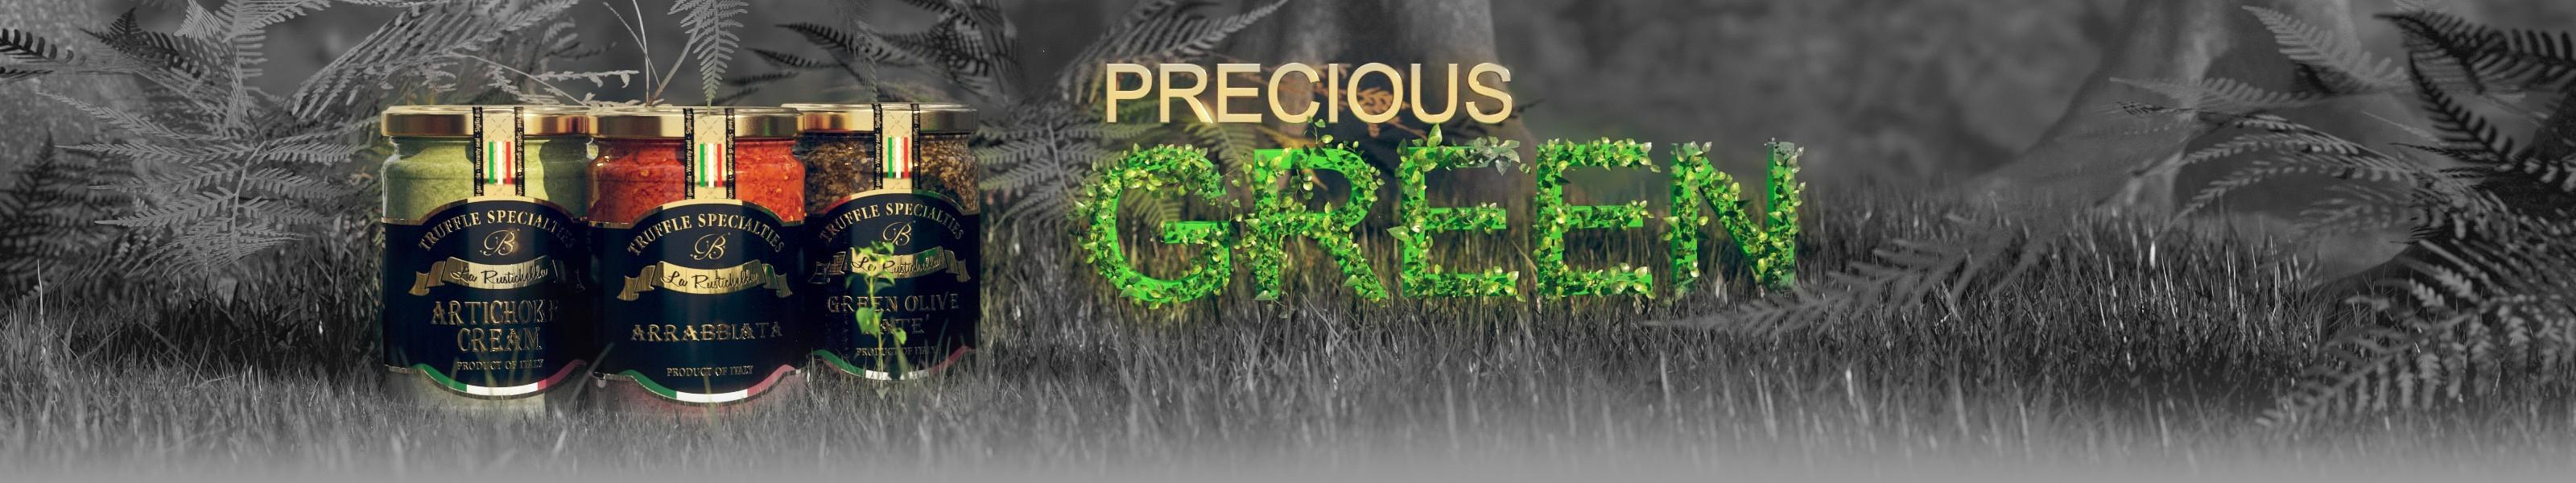 Precious Green